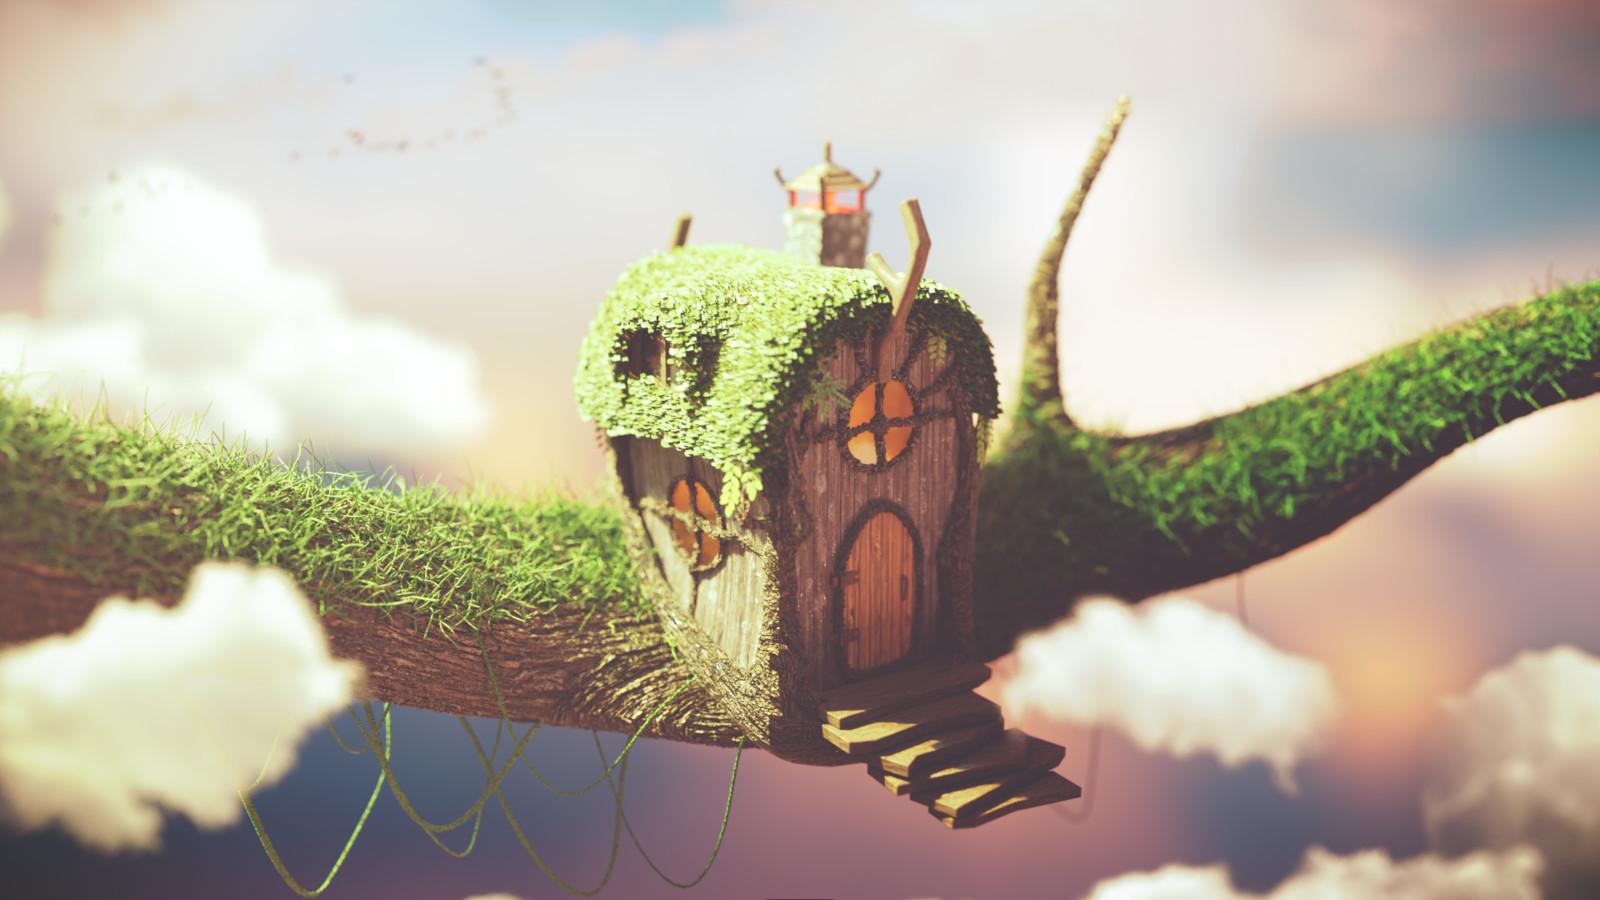 Fairy Tale Tree House (2016 me vs 2018 me)